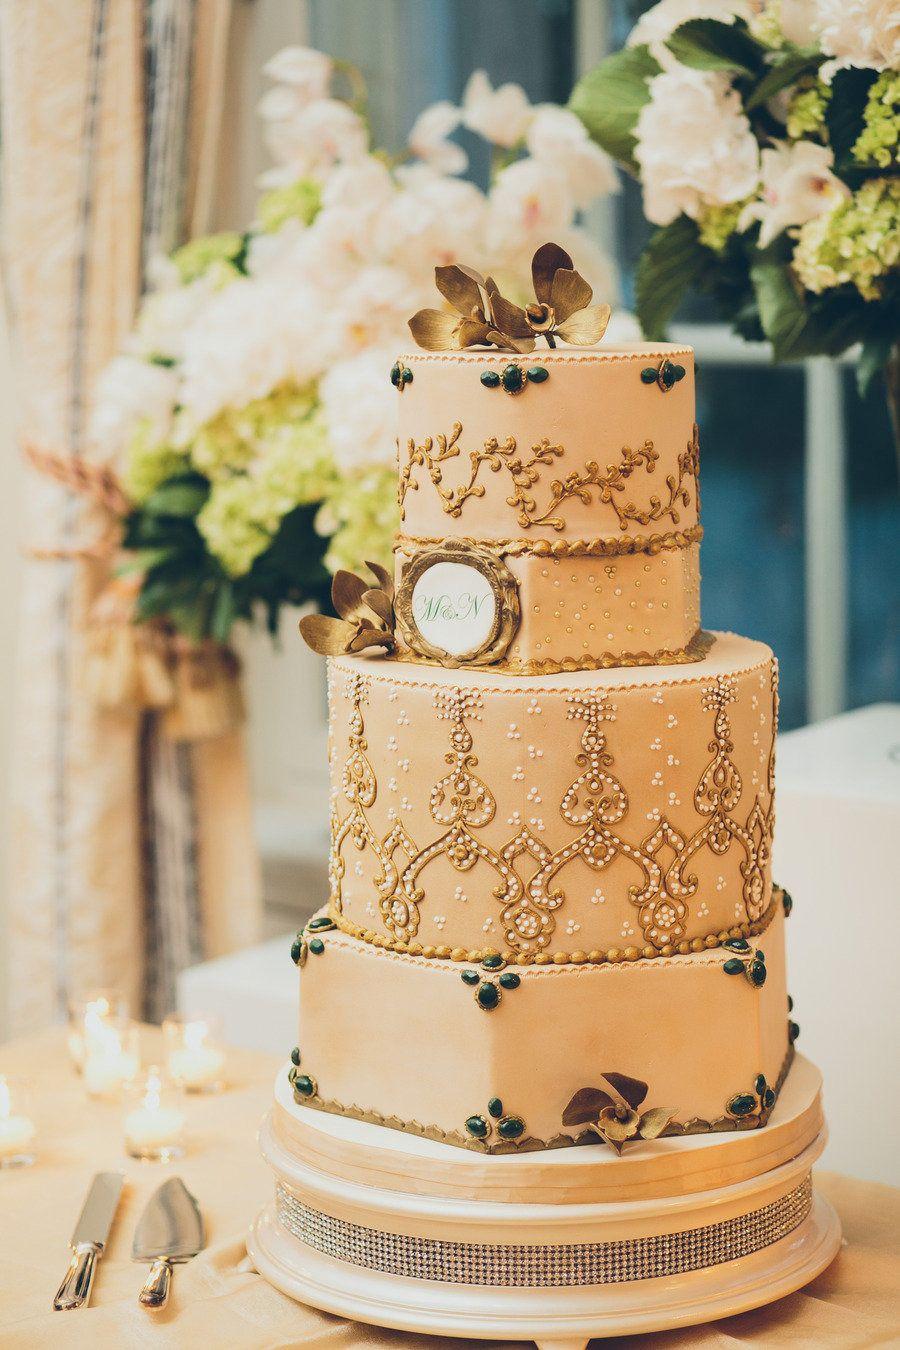 Intricate Wedding Cake | On SMP: http://www.StyleMePretty.com/little-black-book-blog/2013/07/10/edmonton-wedding-from-mango-studios-bella-figura/  Mango Studios